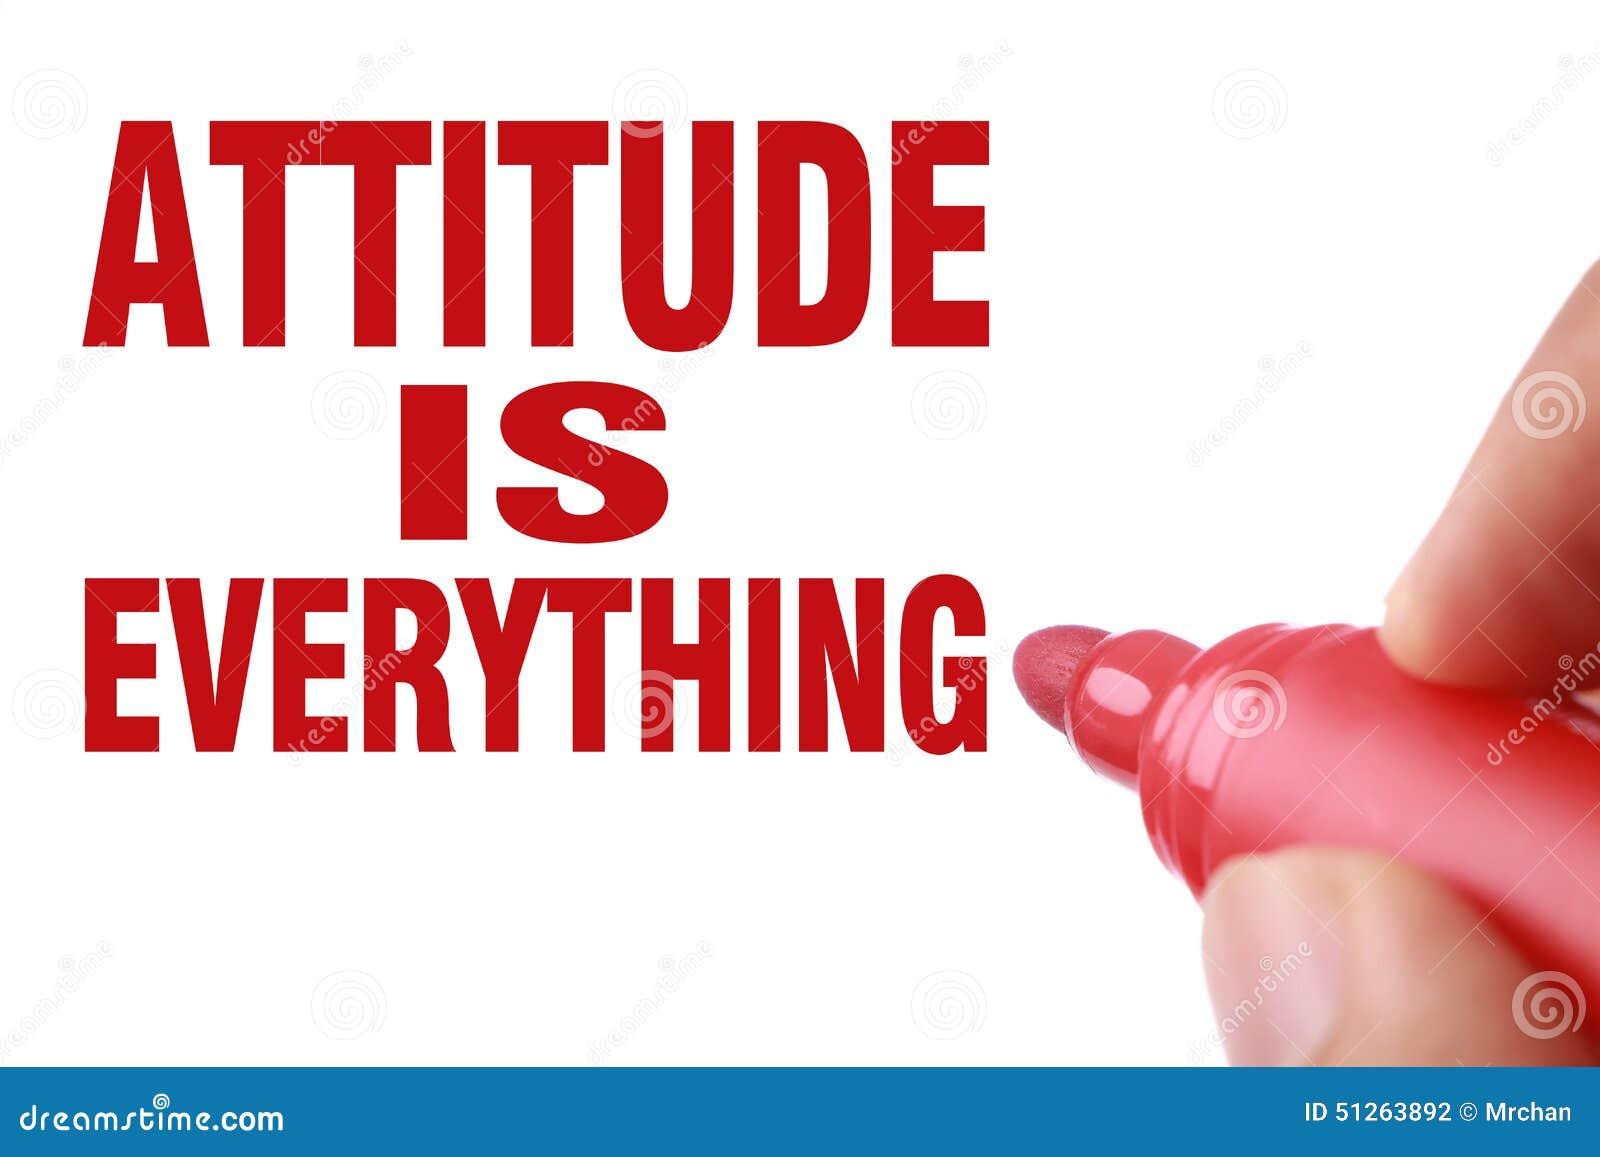 essay on attitude is everything